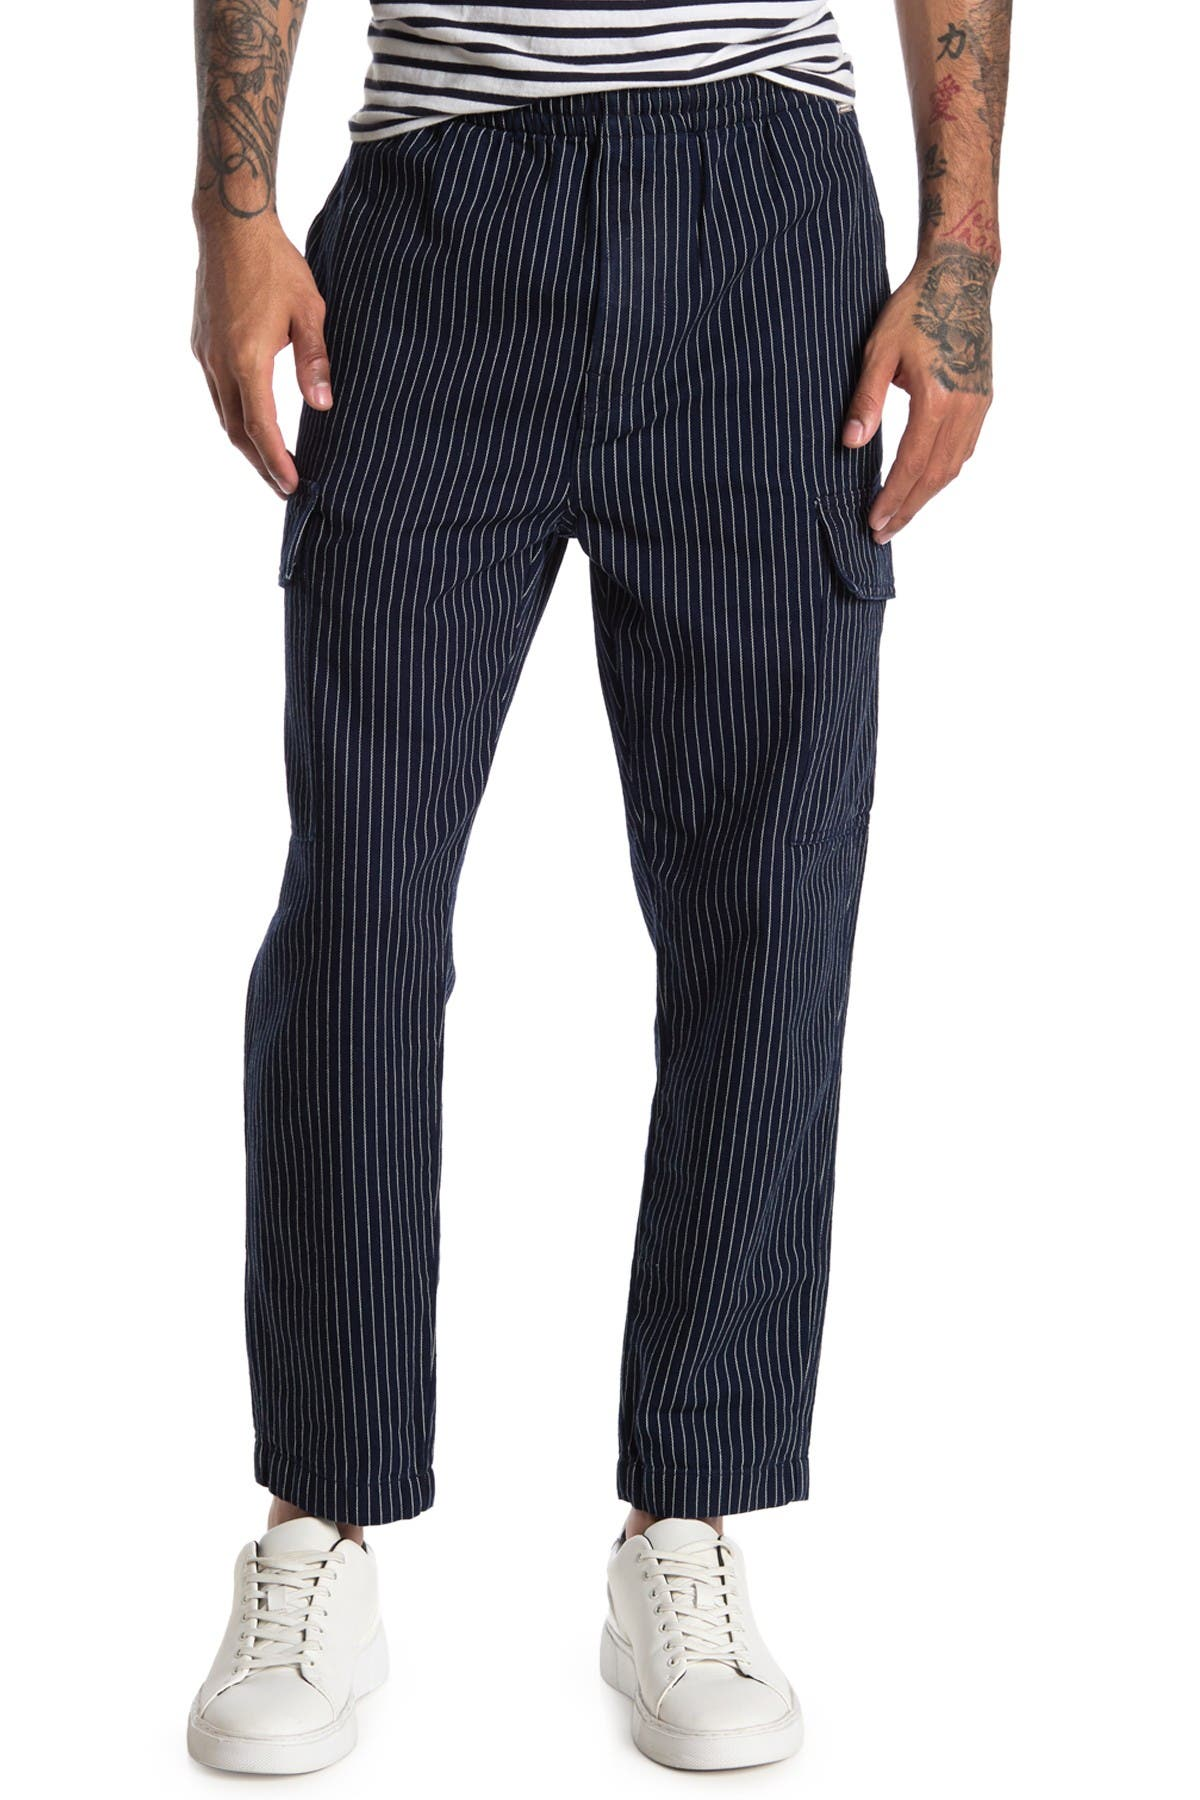 Image of Scotch & Soda AMS Pinstripe Indigo Cargo Pants